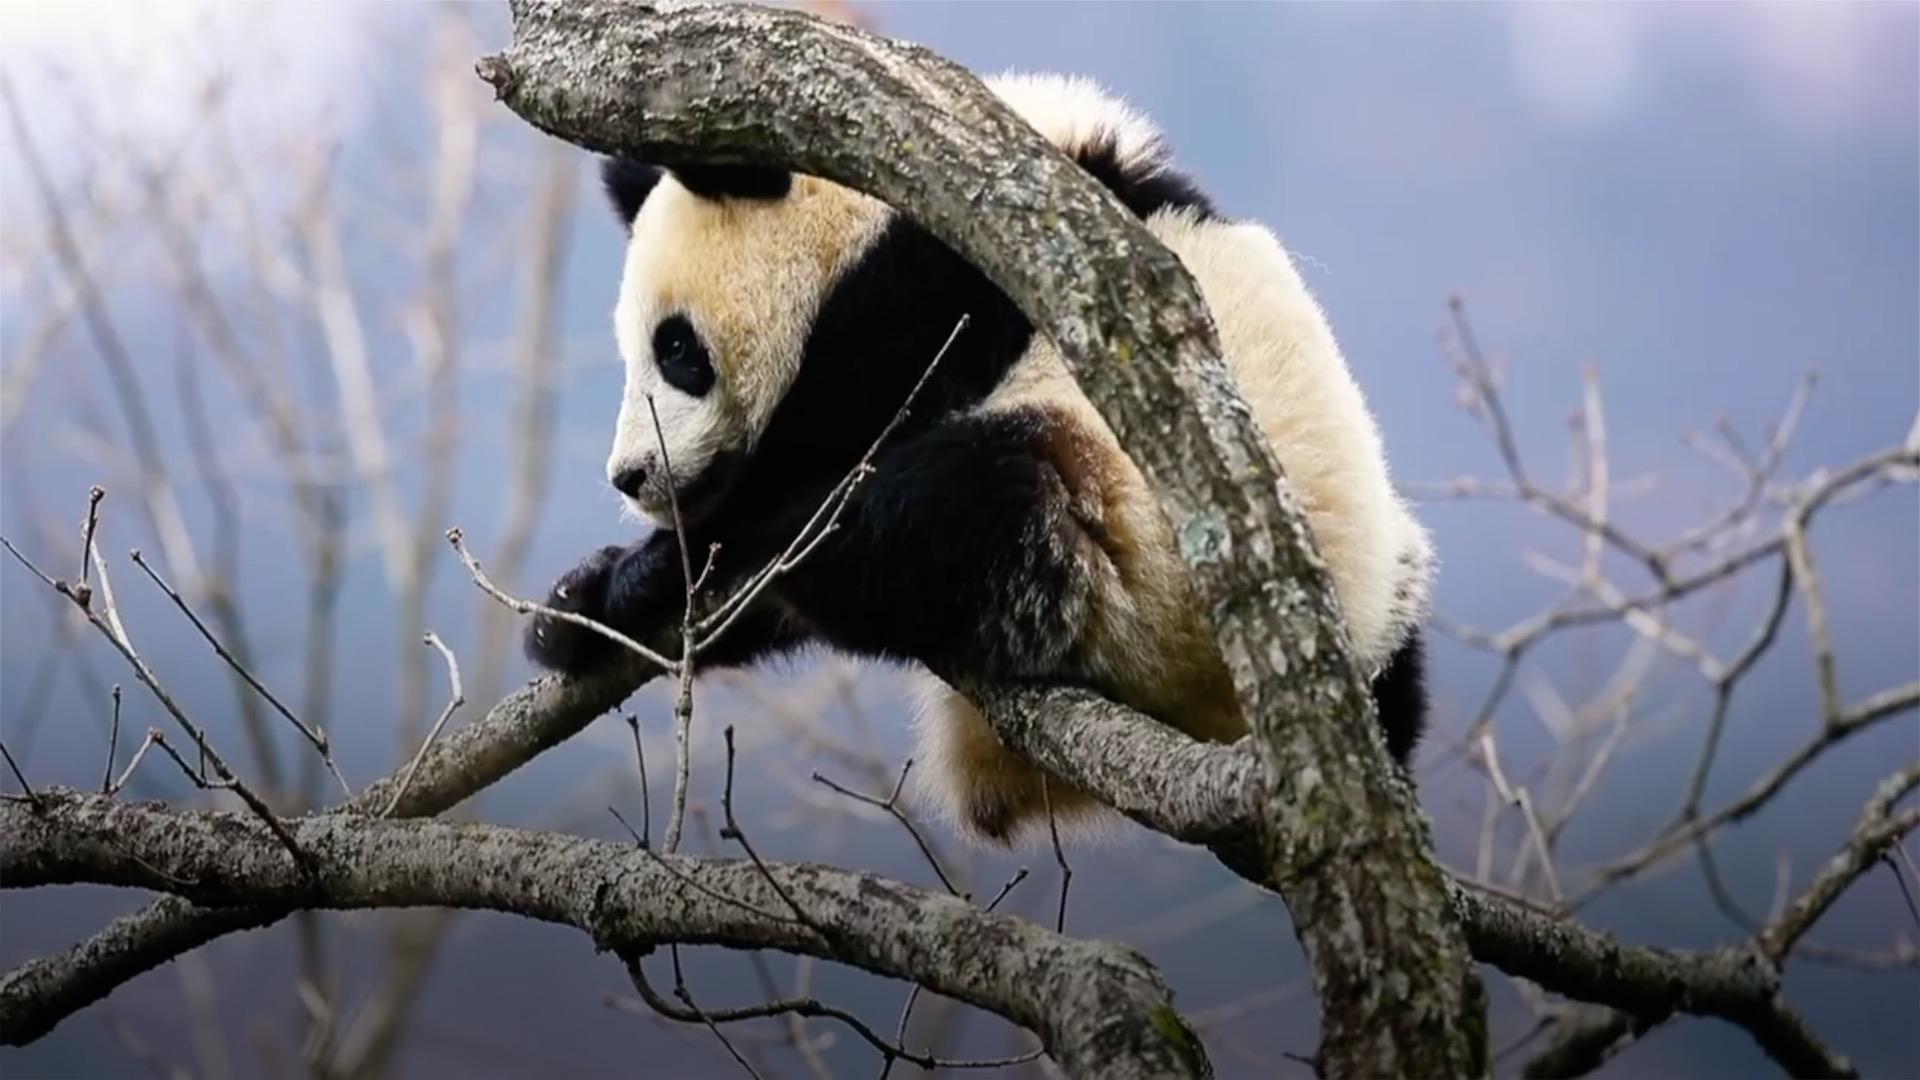 Story of panda village: How panda changed residents' life